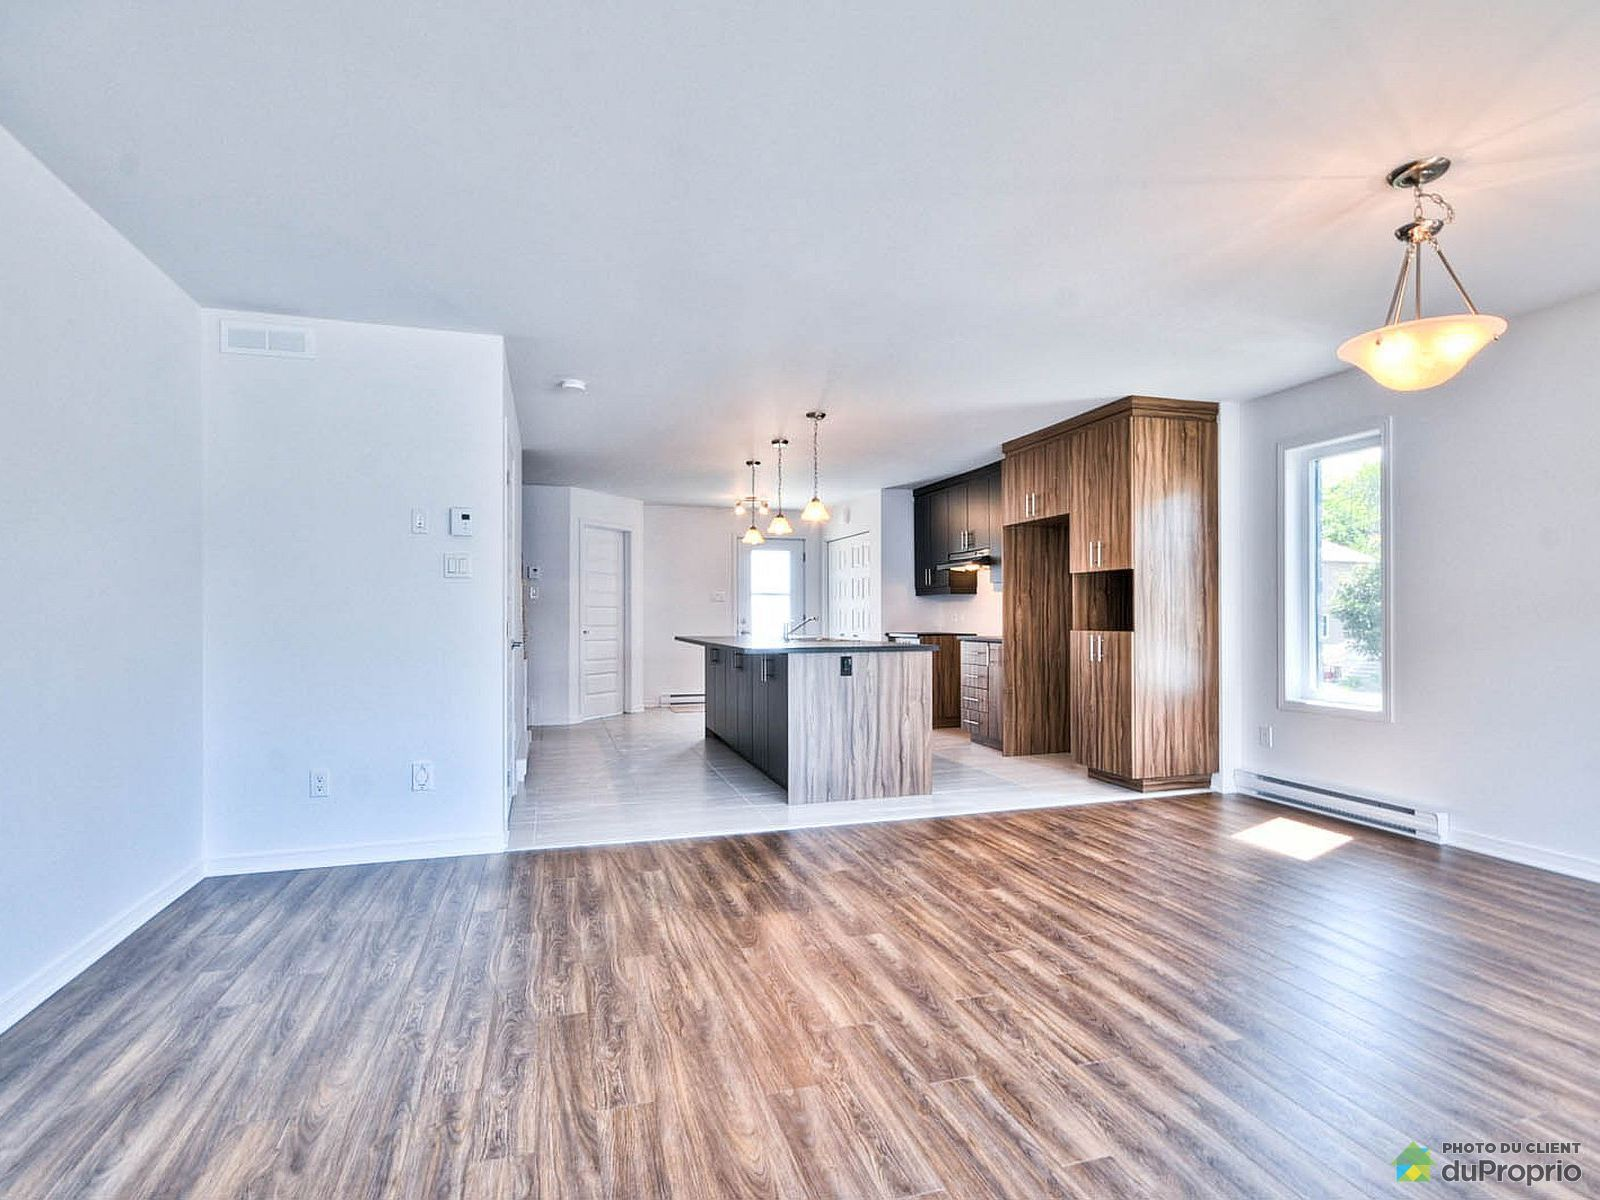 Jumel neuf vendre aylmer boulevard d 39 amsterdam immobilier qu bec d - Appartement a vendre a amsterdam ...